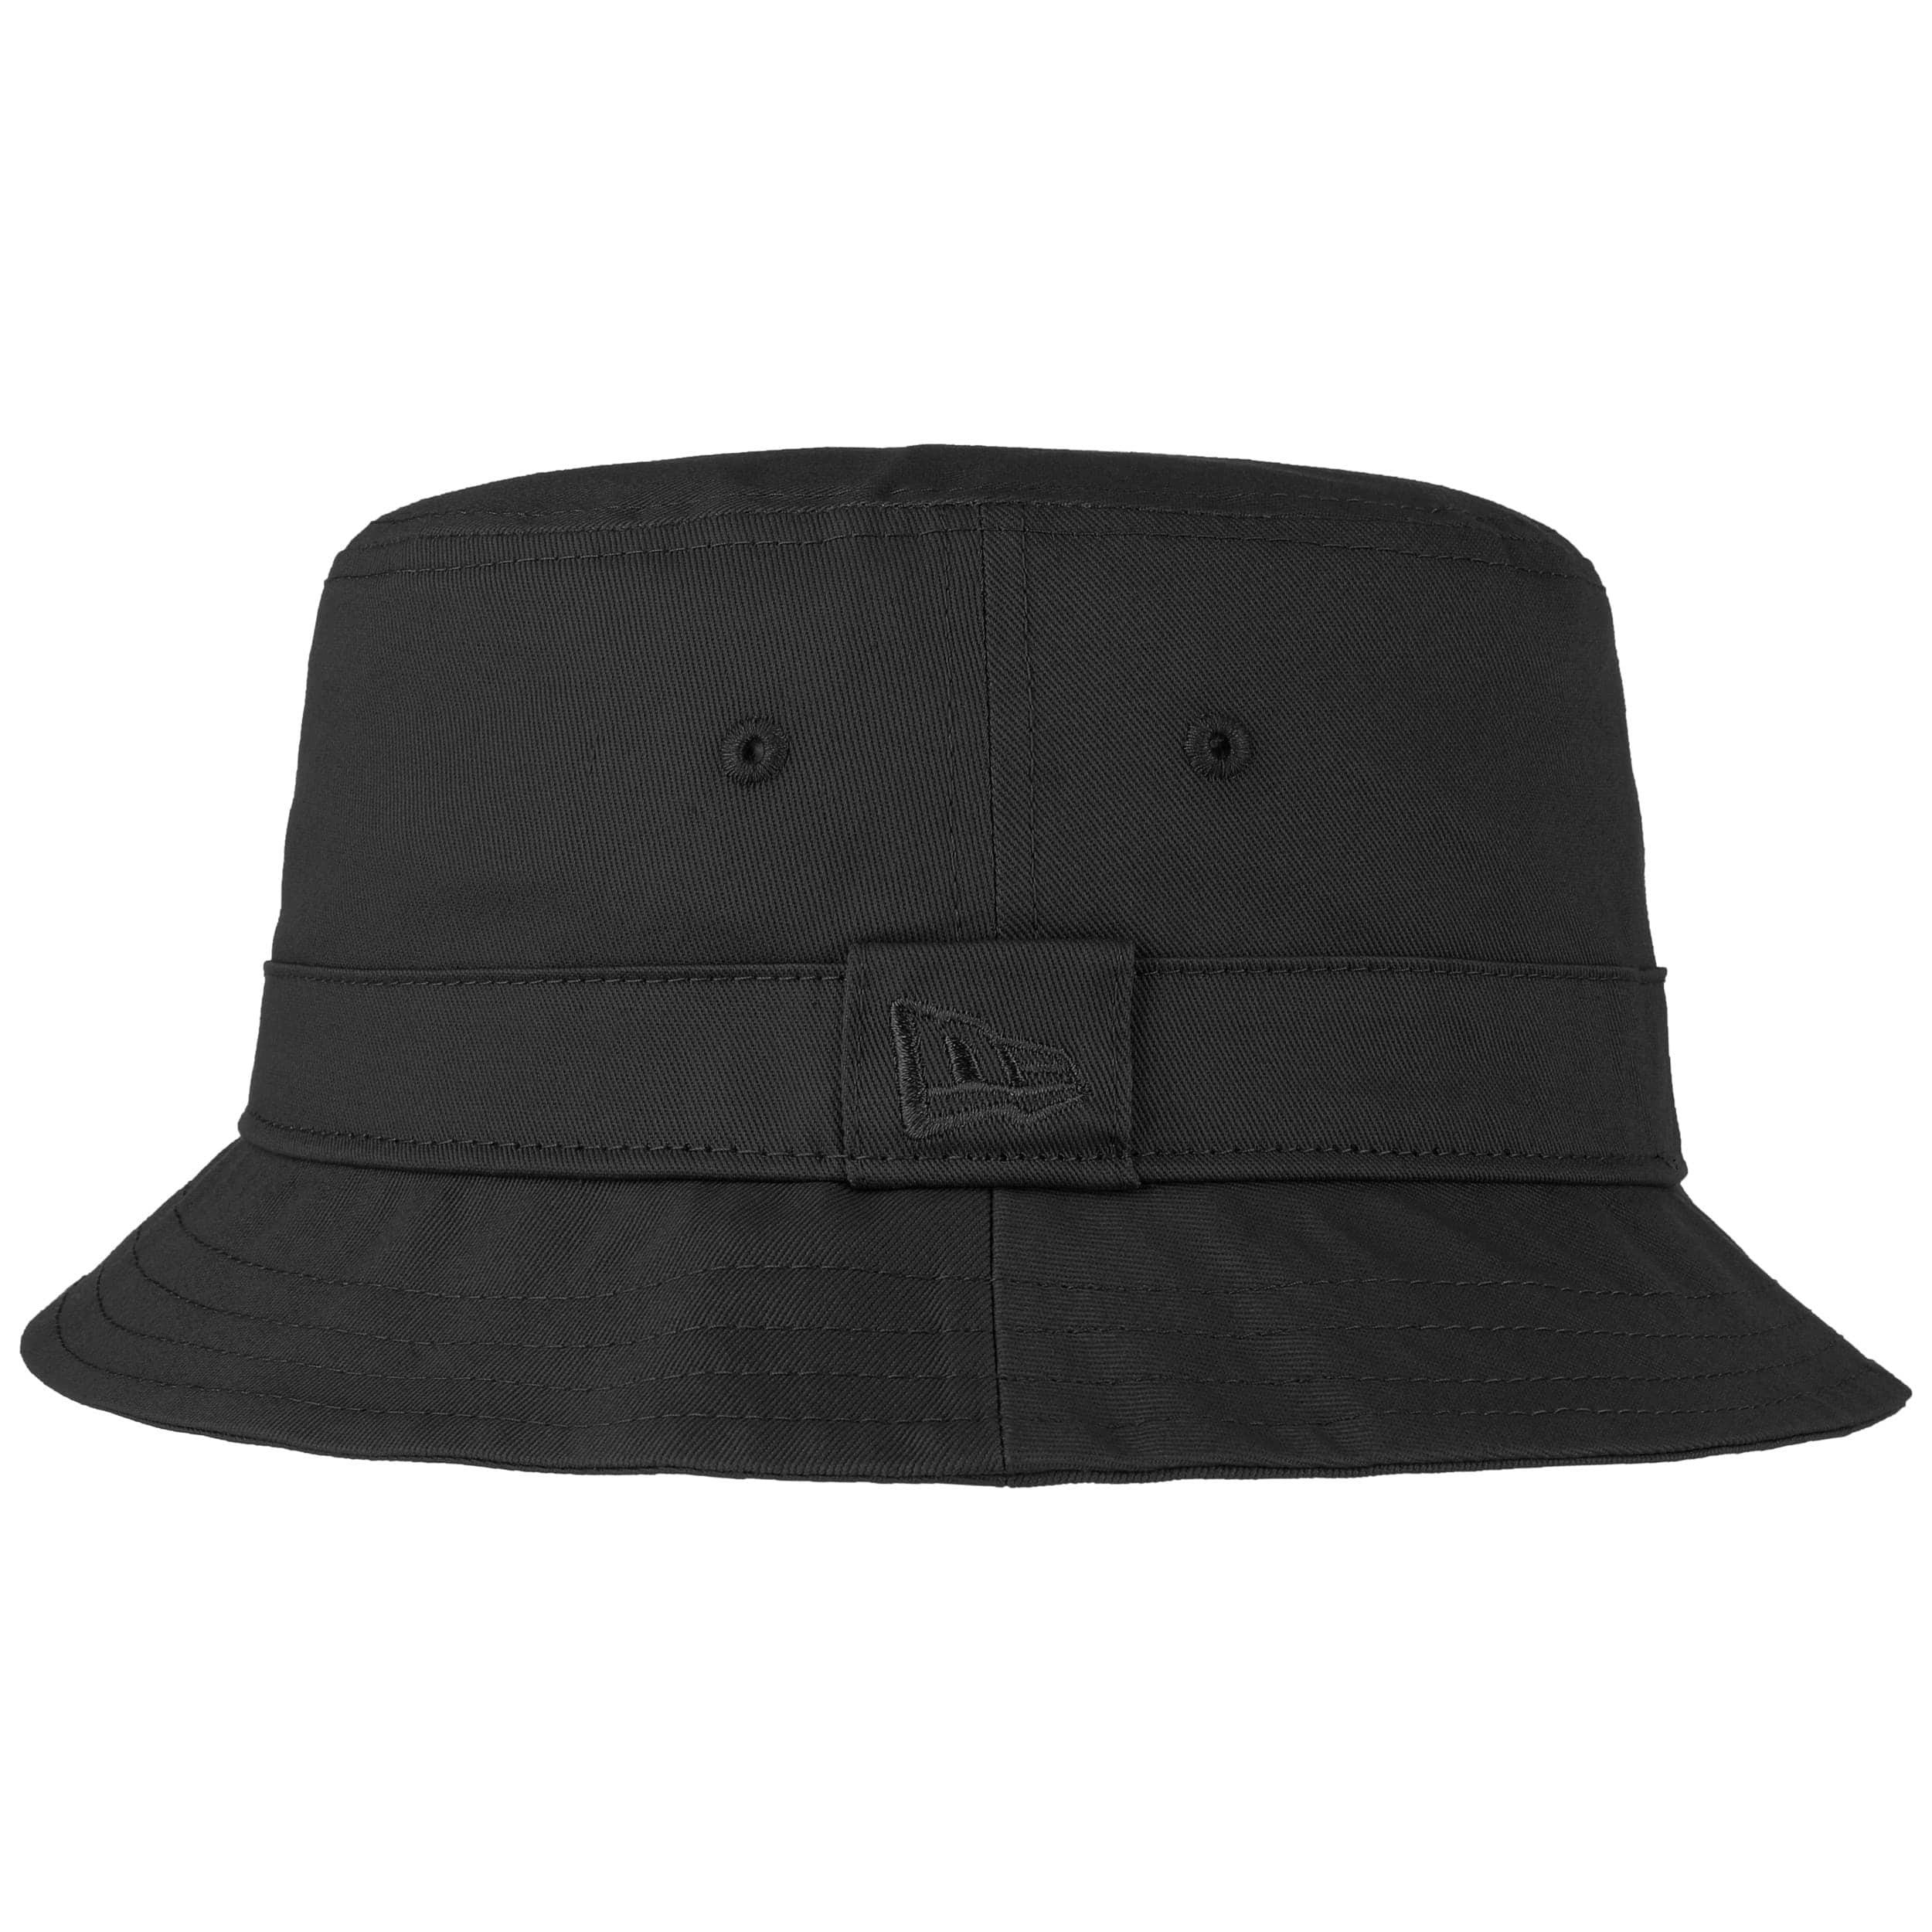 5ce7506f81bdf ... new zealand seasonal bucket hat by new era black 3 342a3 227ed